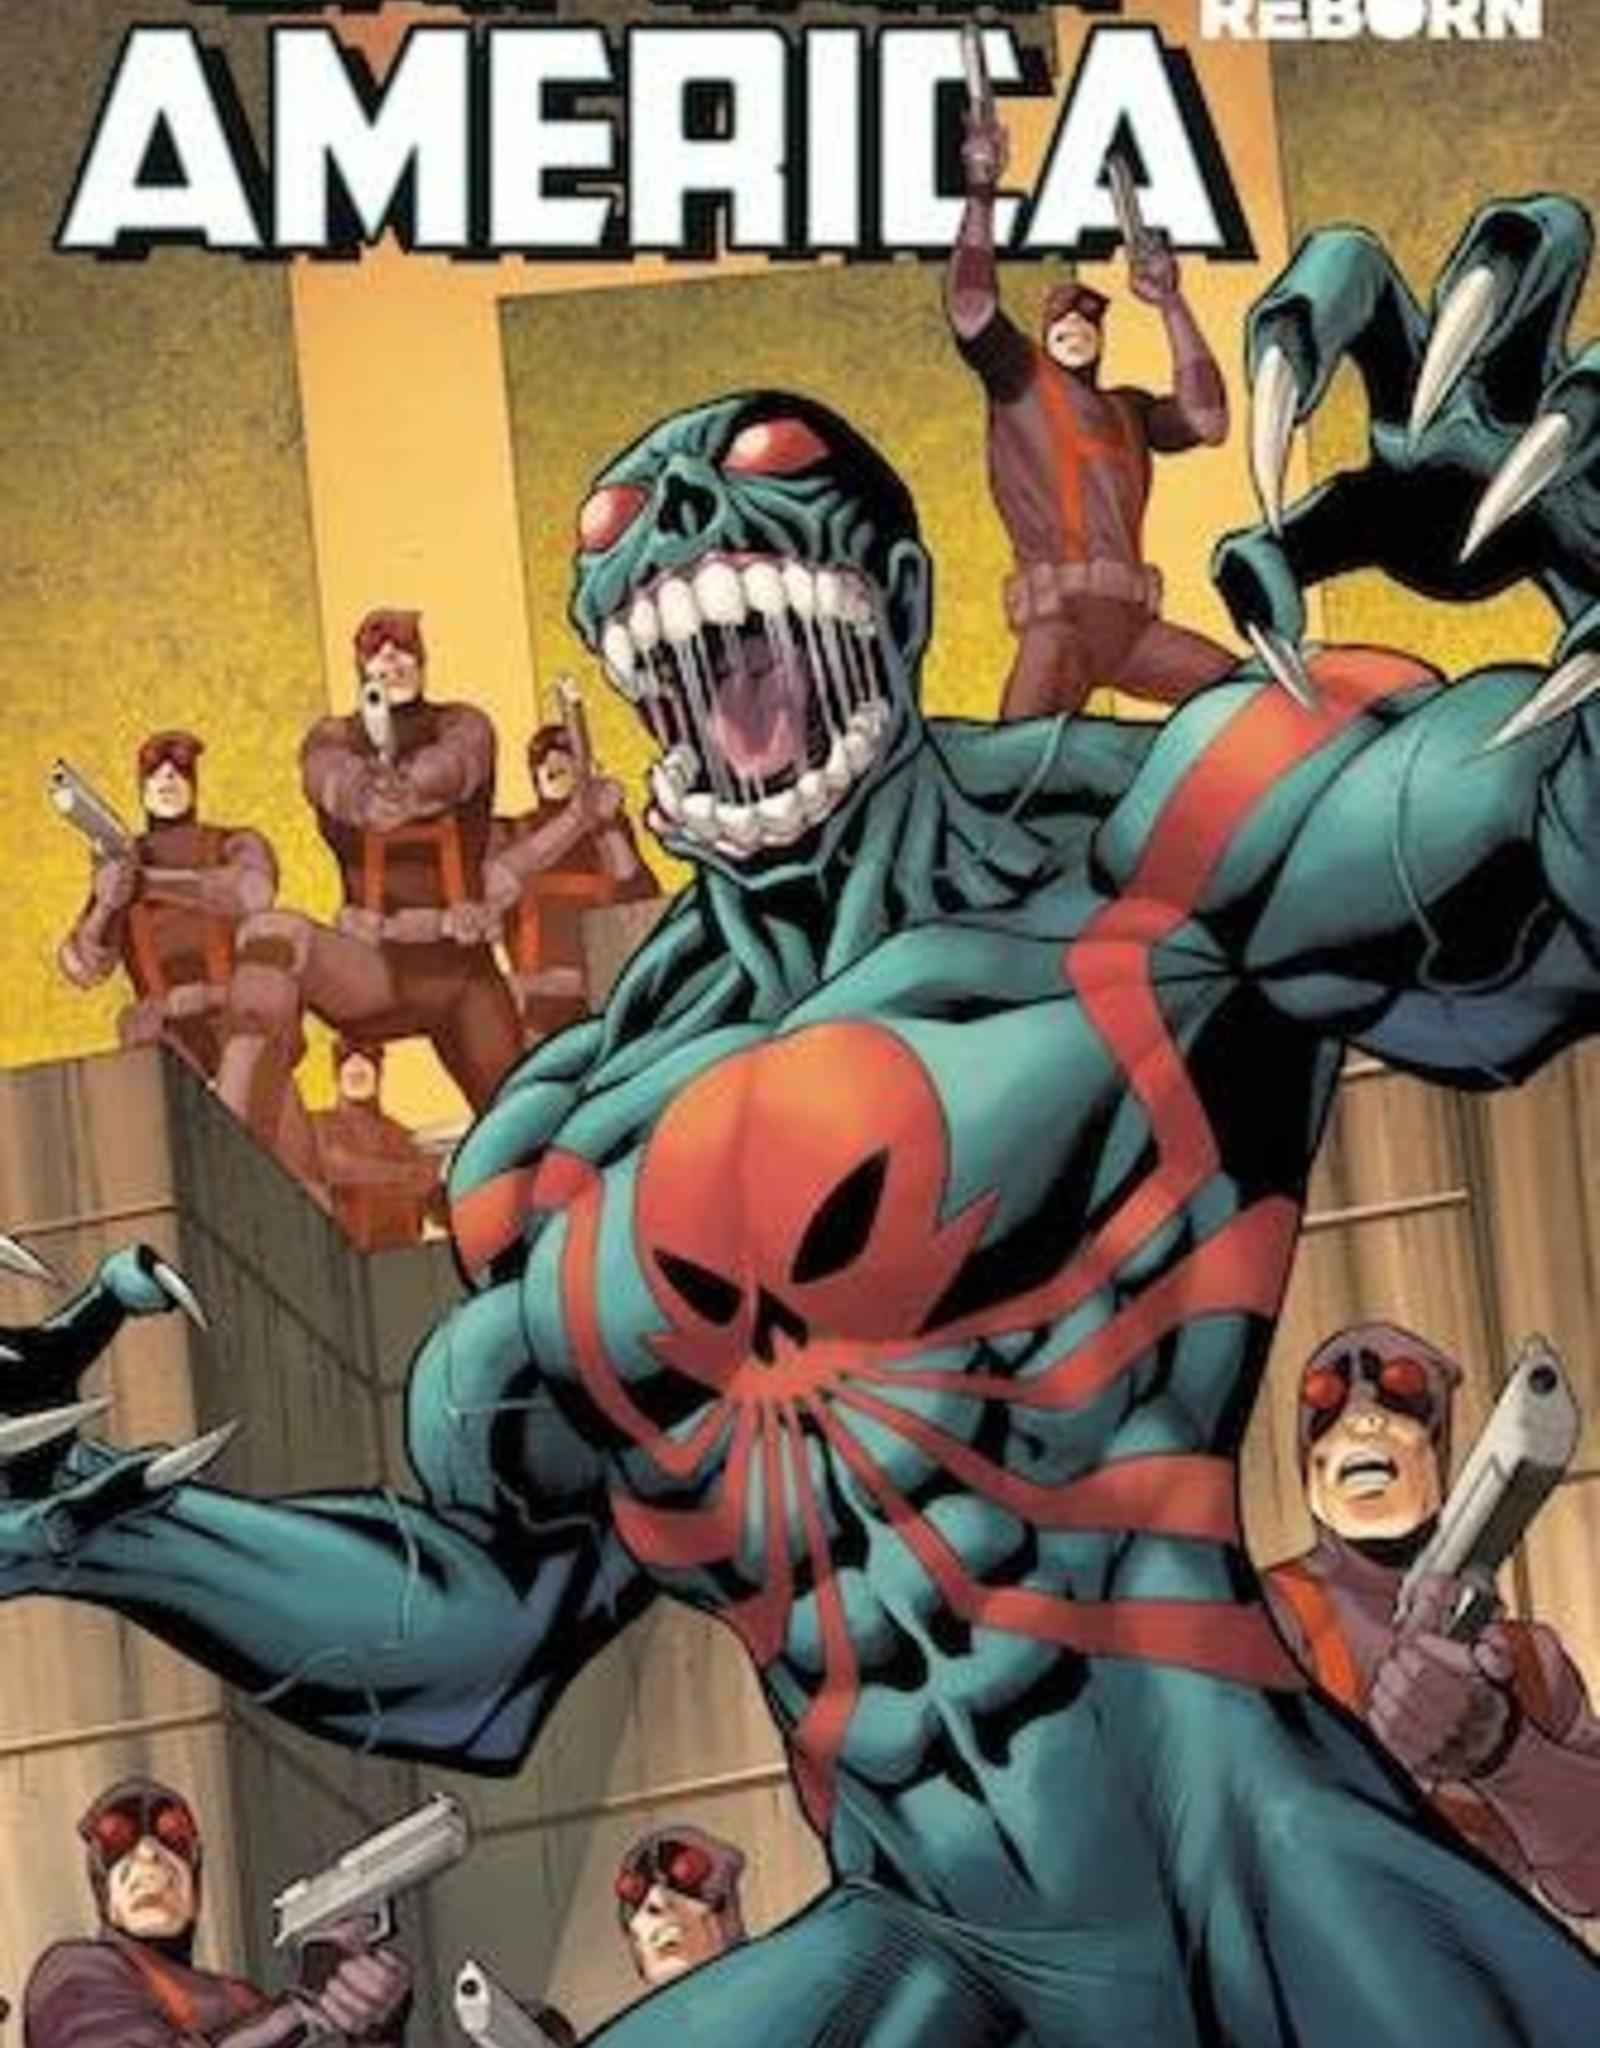 Marvel Comics Captain America #29 Pacheco Reborn Var